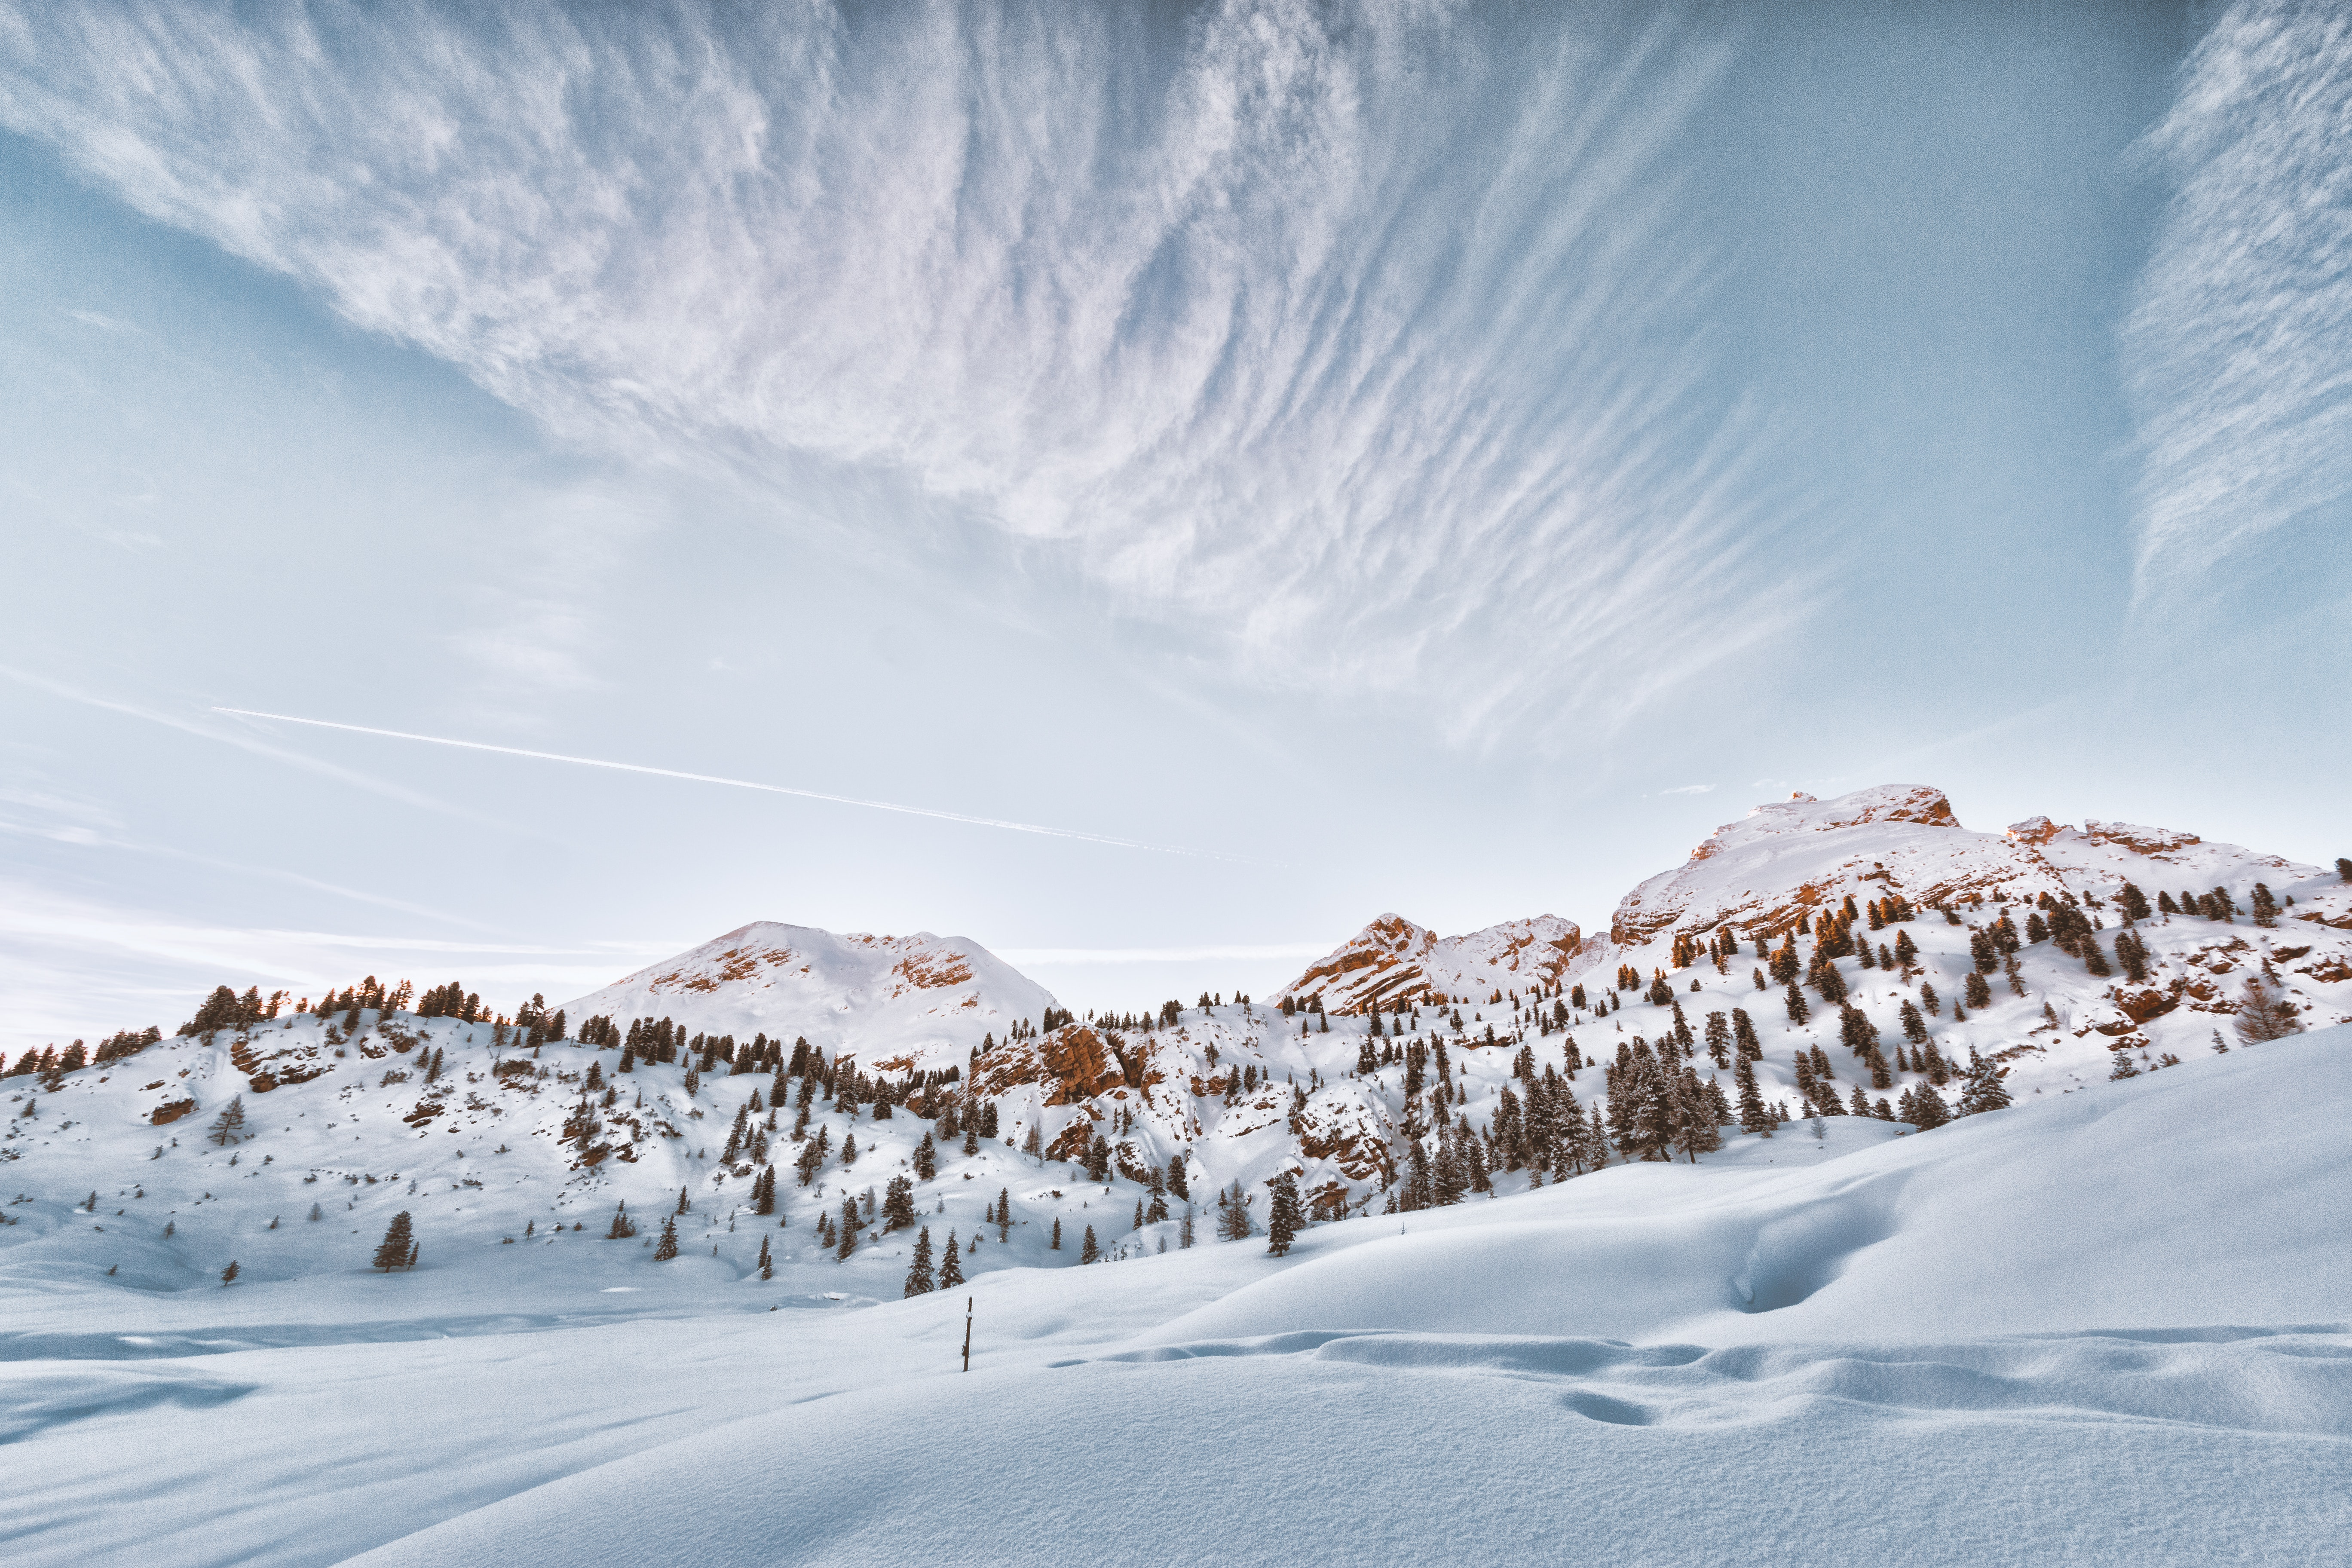 mountains covered in snow 1574939626 - Mountains Covered In Snow -